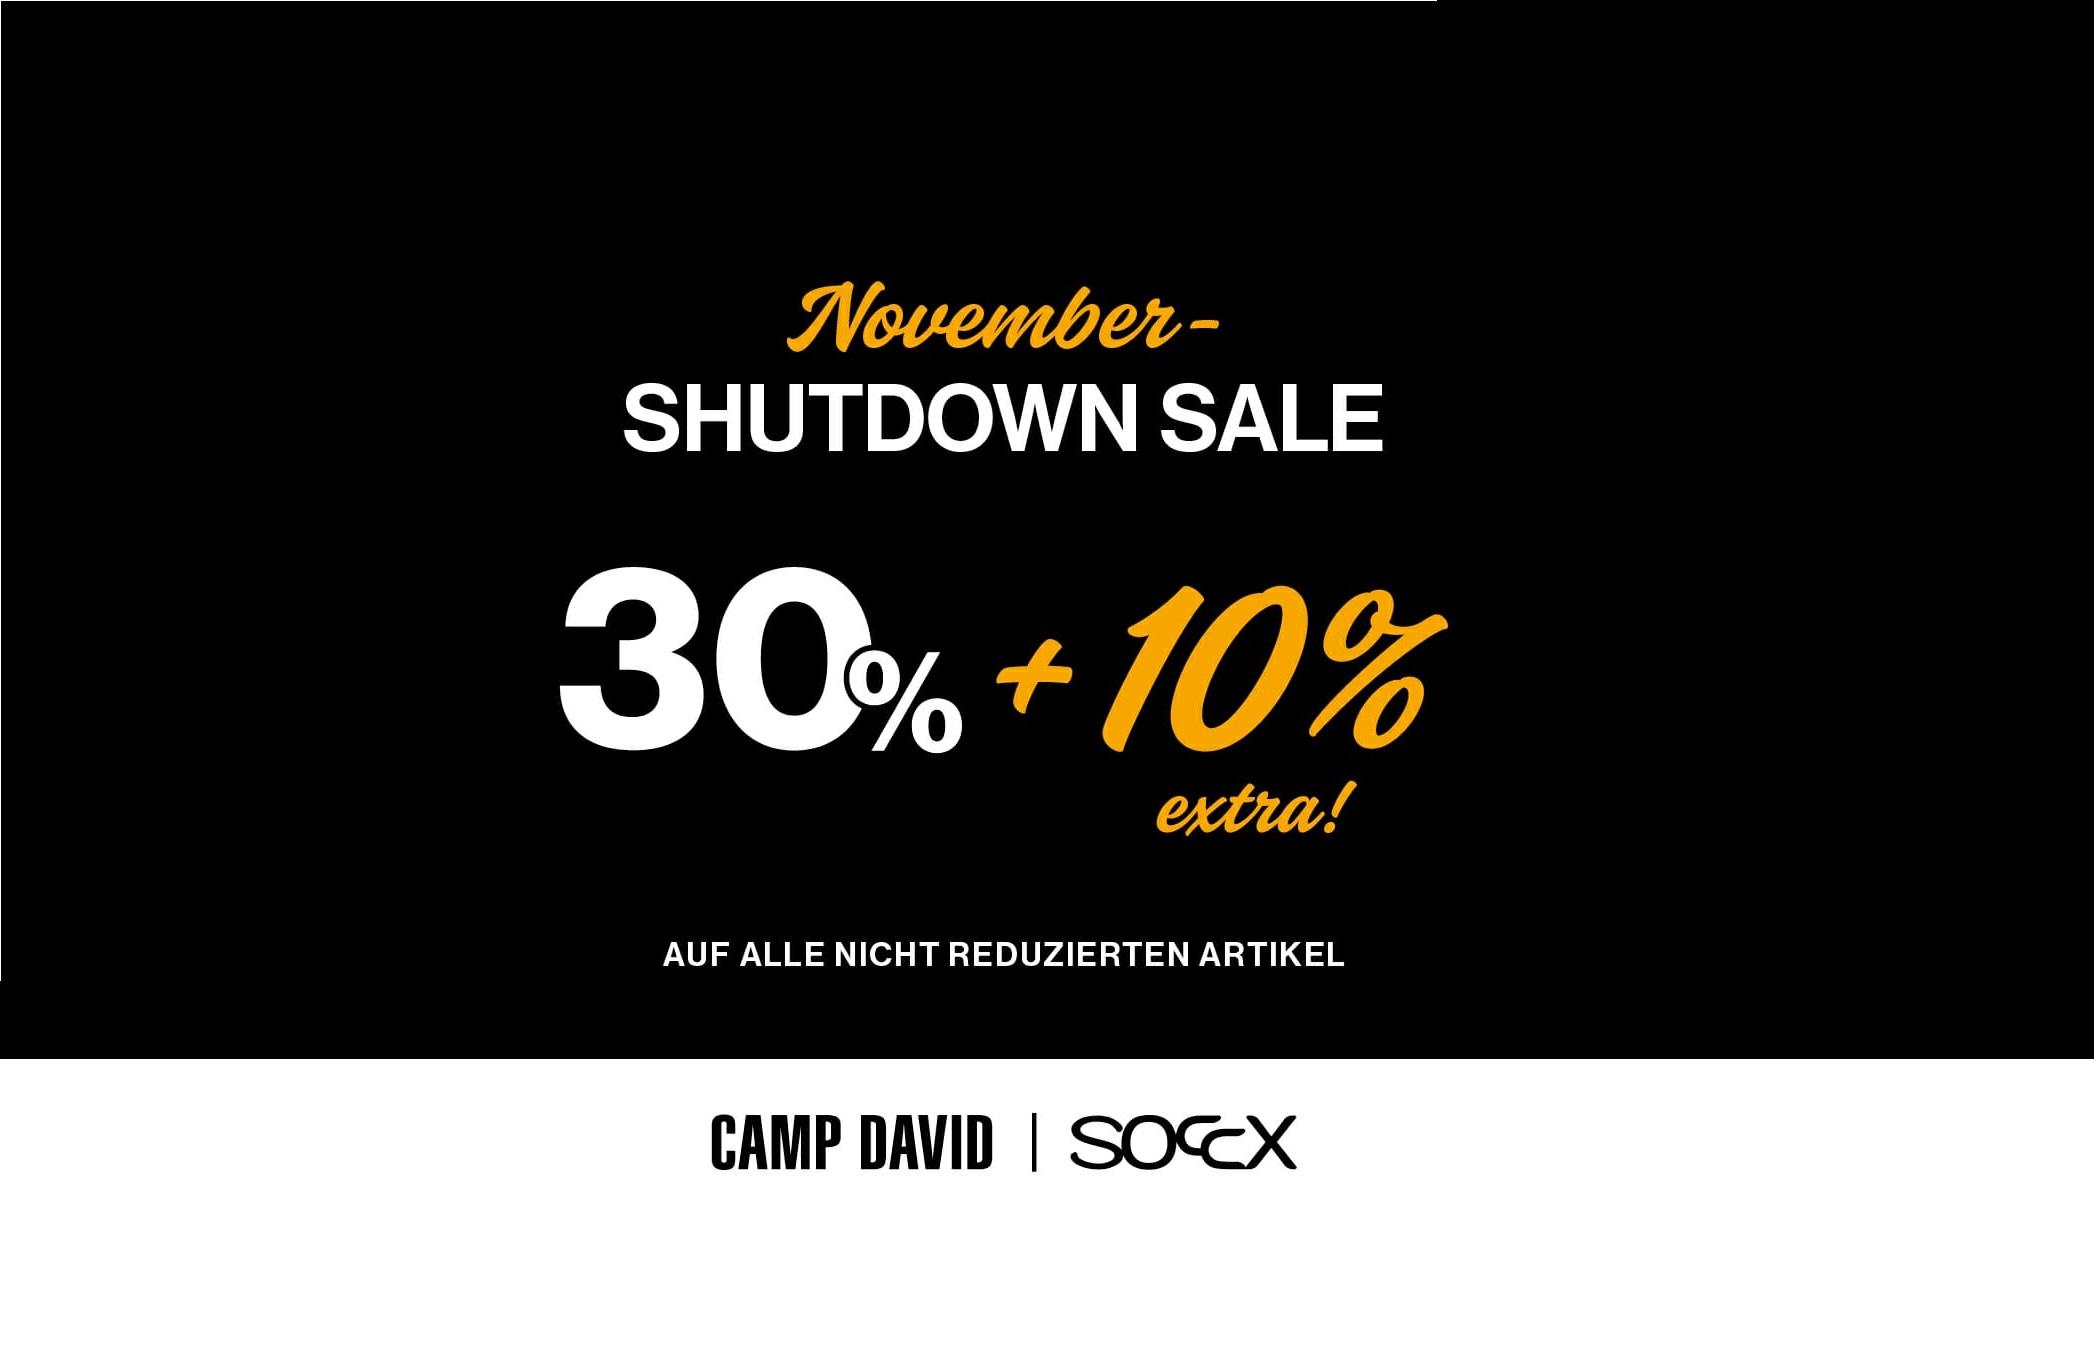 Camp David/ Soccx